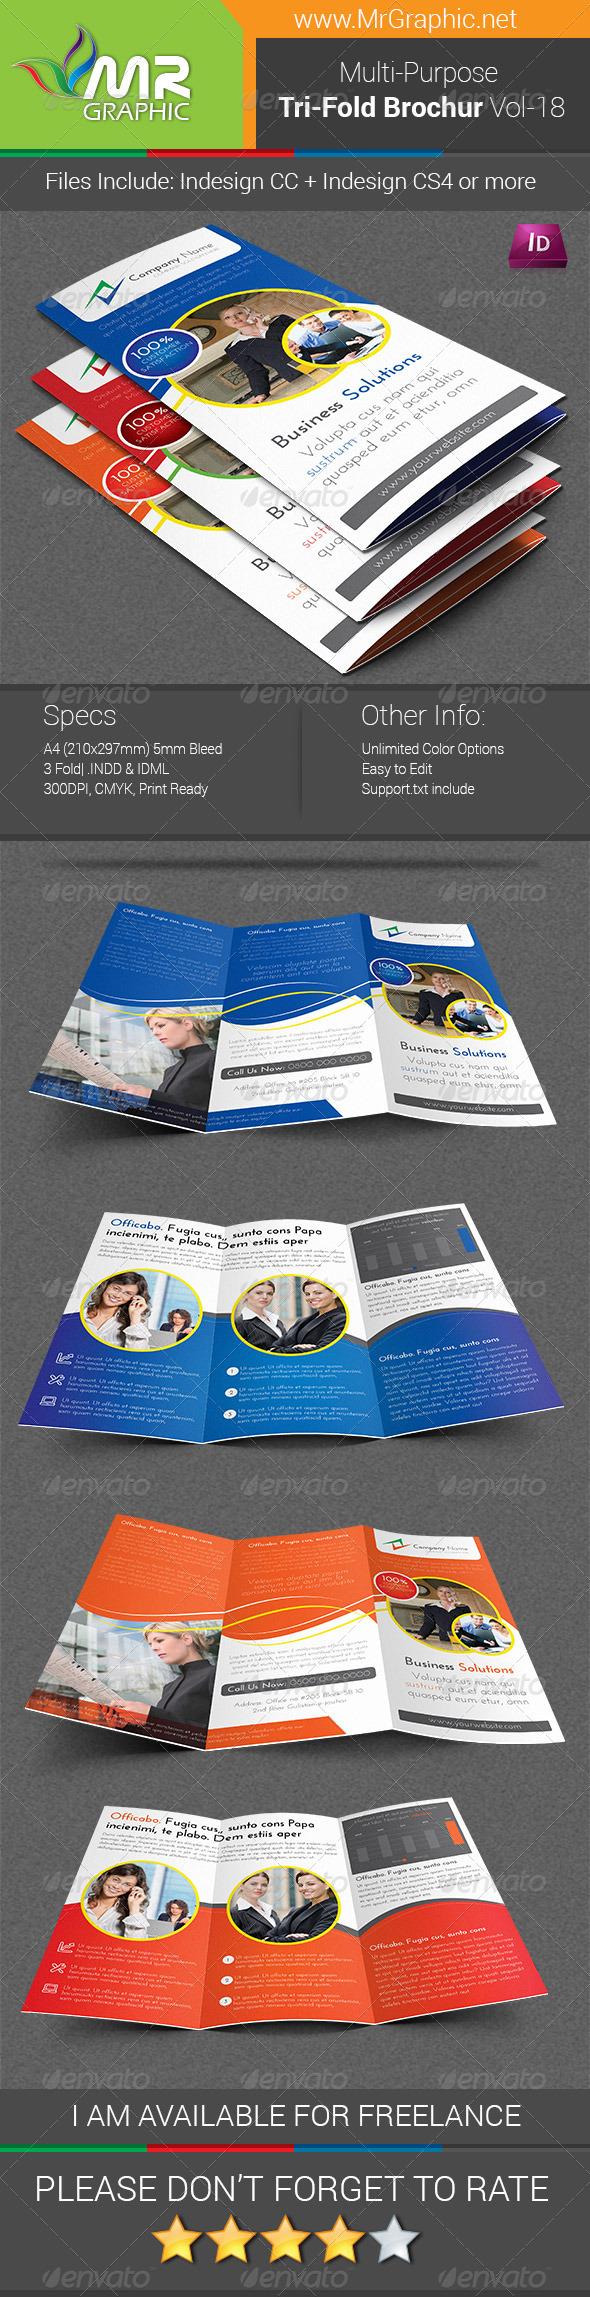 Multipurpose Business Tri-Fold Brochure Vol-18 - Corporate Brochures